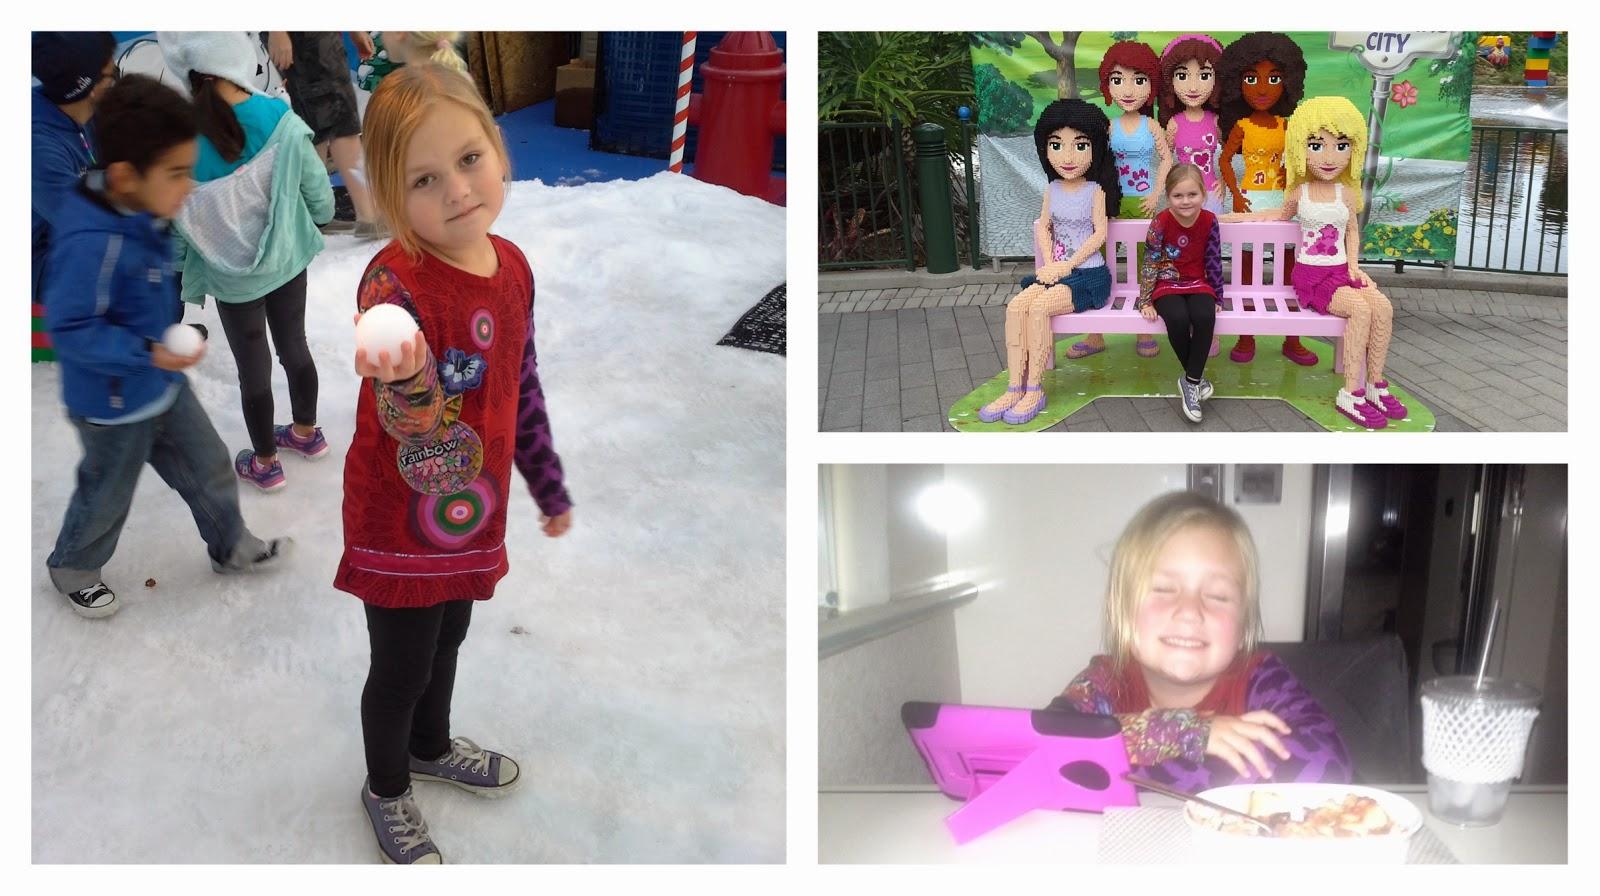 Lizzie Lau Legoland Fun with Snow and Grandparents